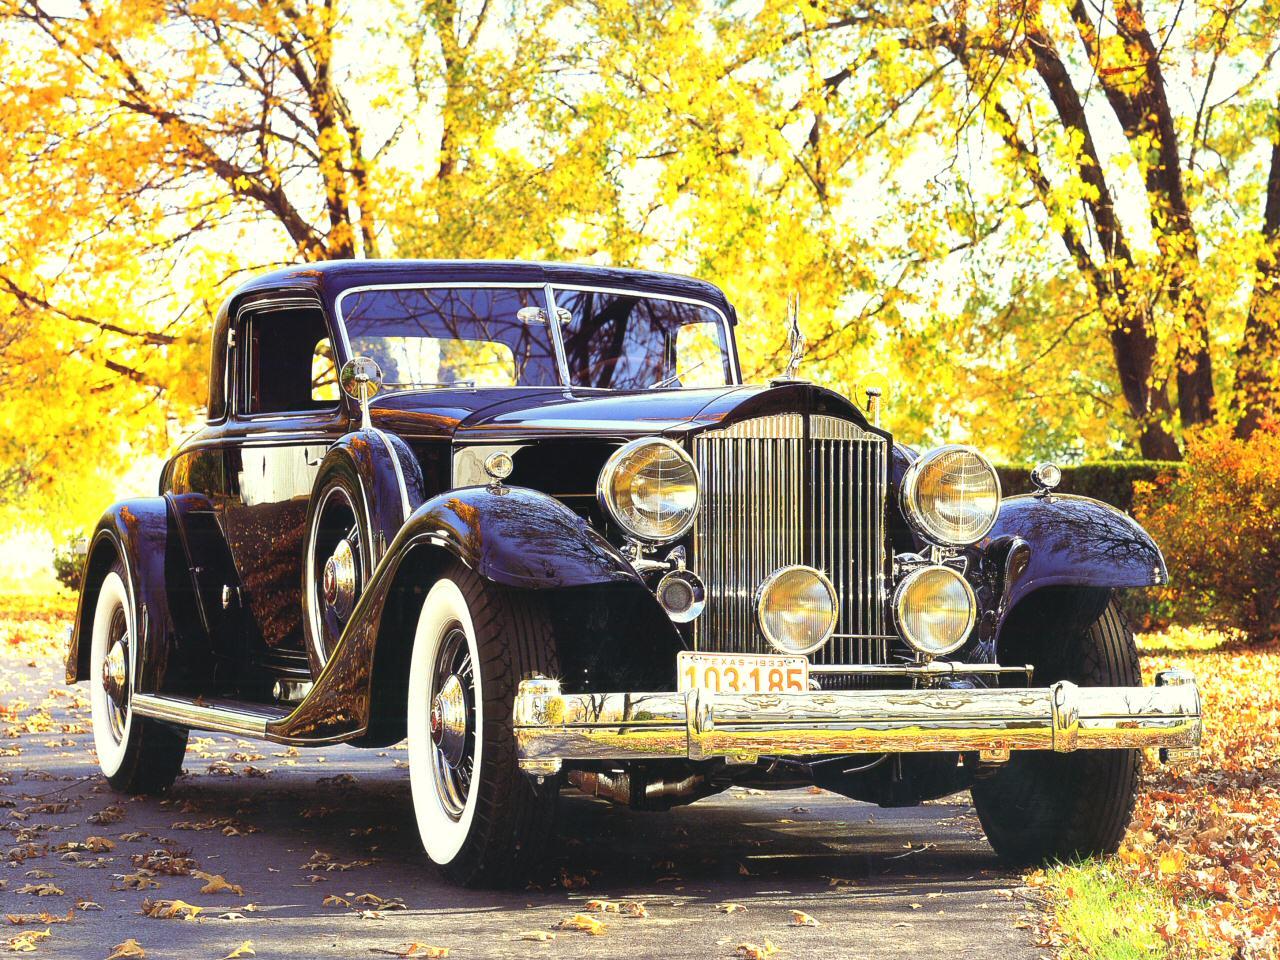 1933 Packard Twelve 1006 Deitrich V Windshield Sport Coupe Black Fvr